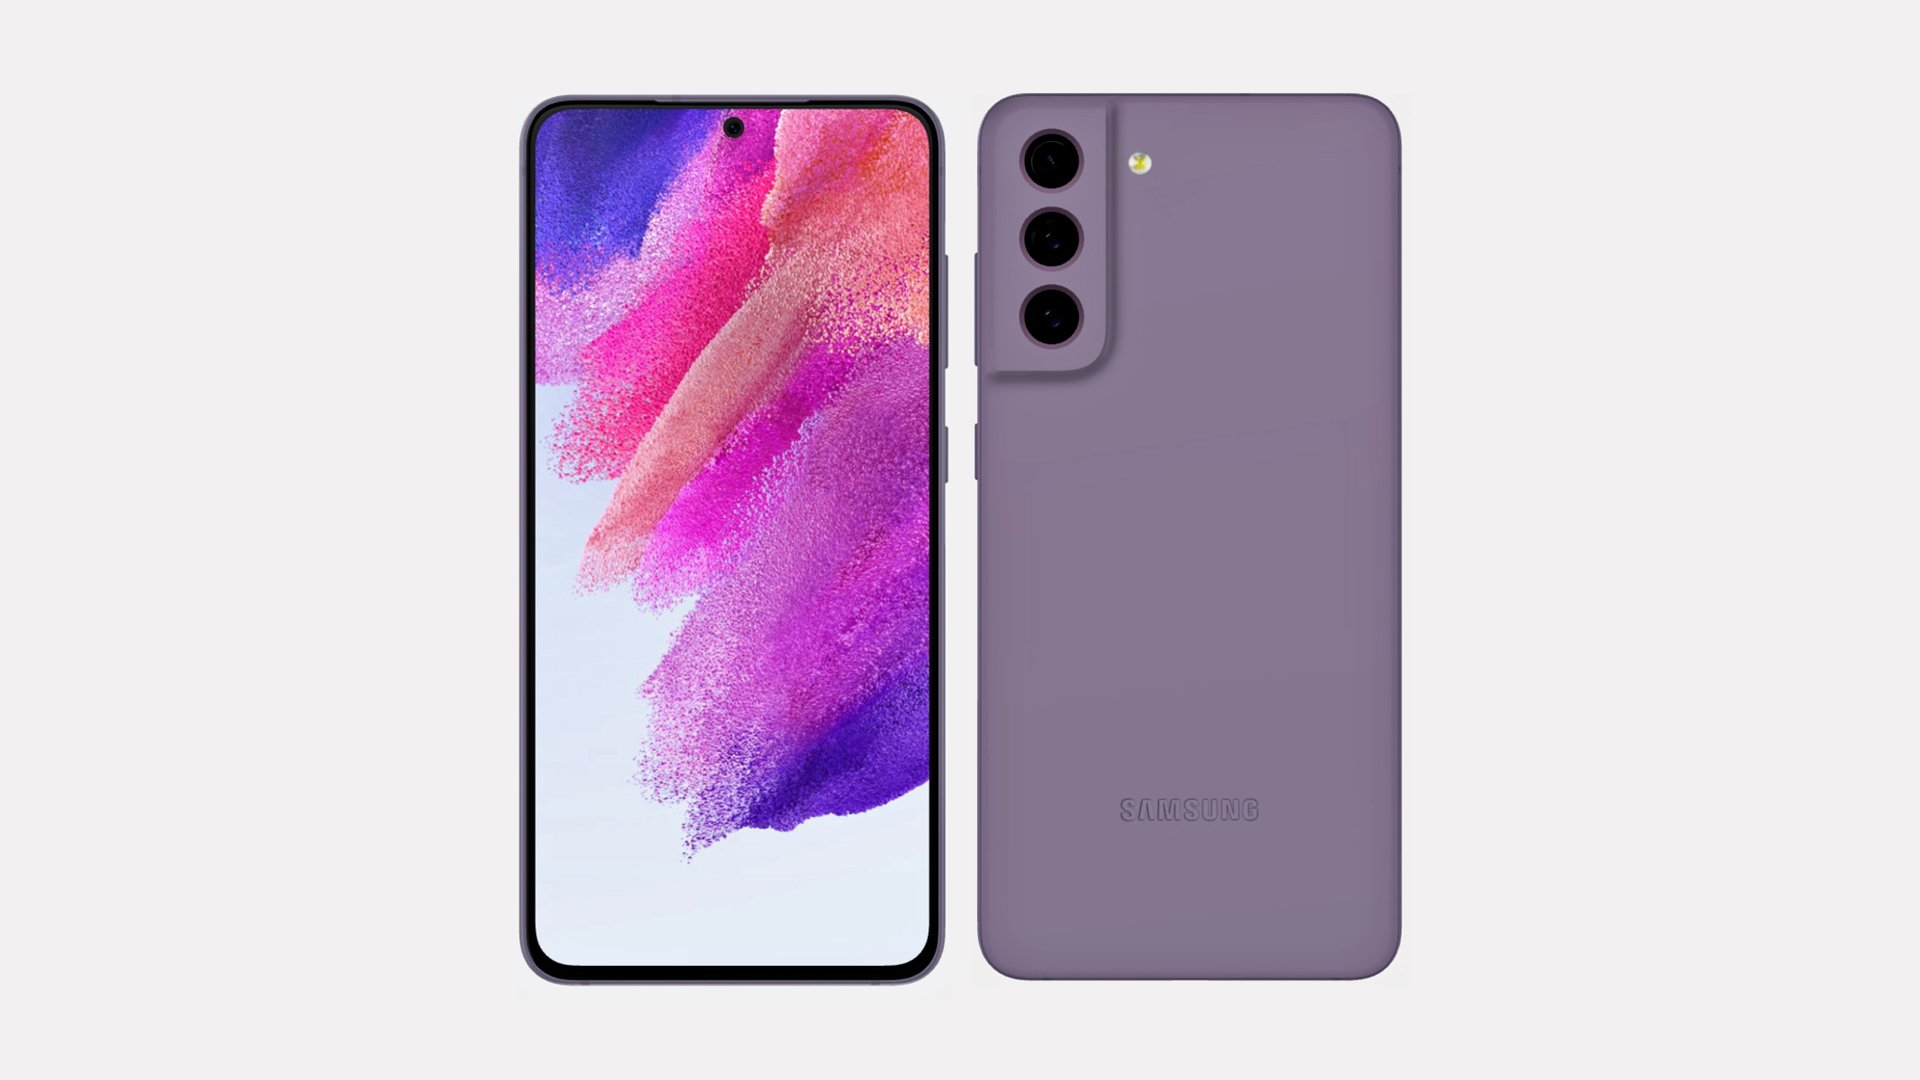 Samsung Galaxy S21 FE: Μία ακόμα διαρροή specs